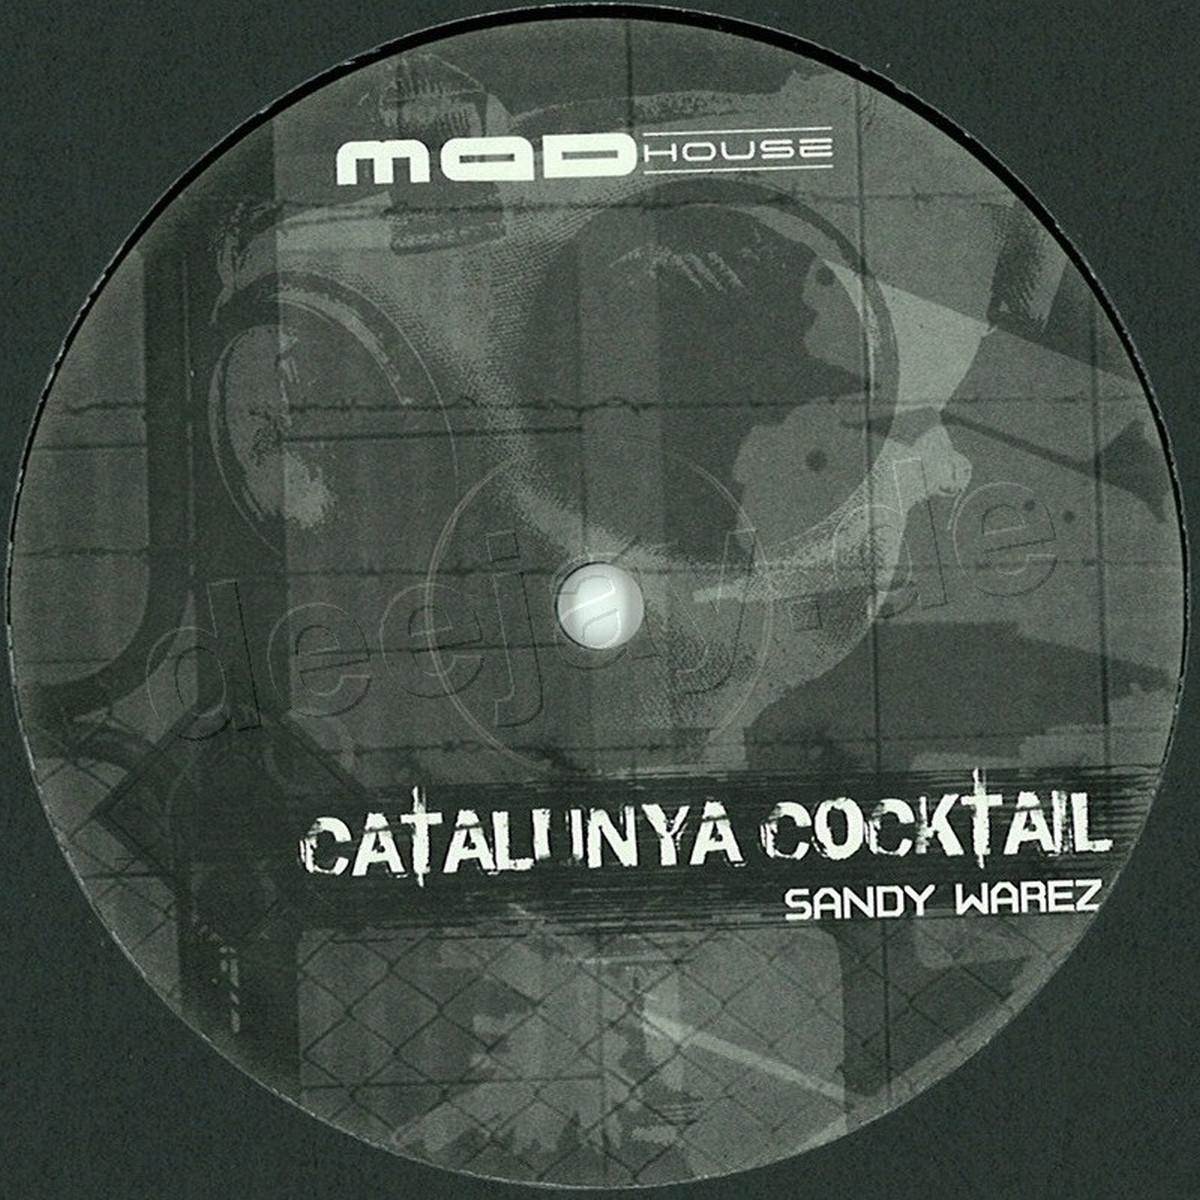 Sandy Warez - Catalunya Cocktail / Madhouse Records MAD002 - Vinyl